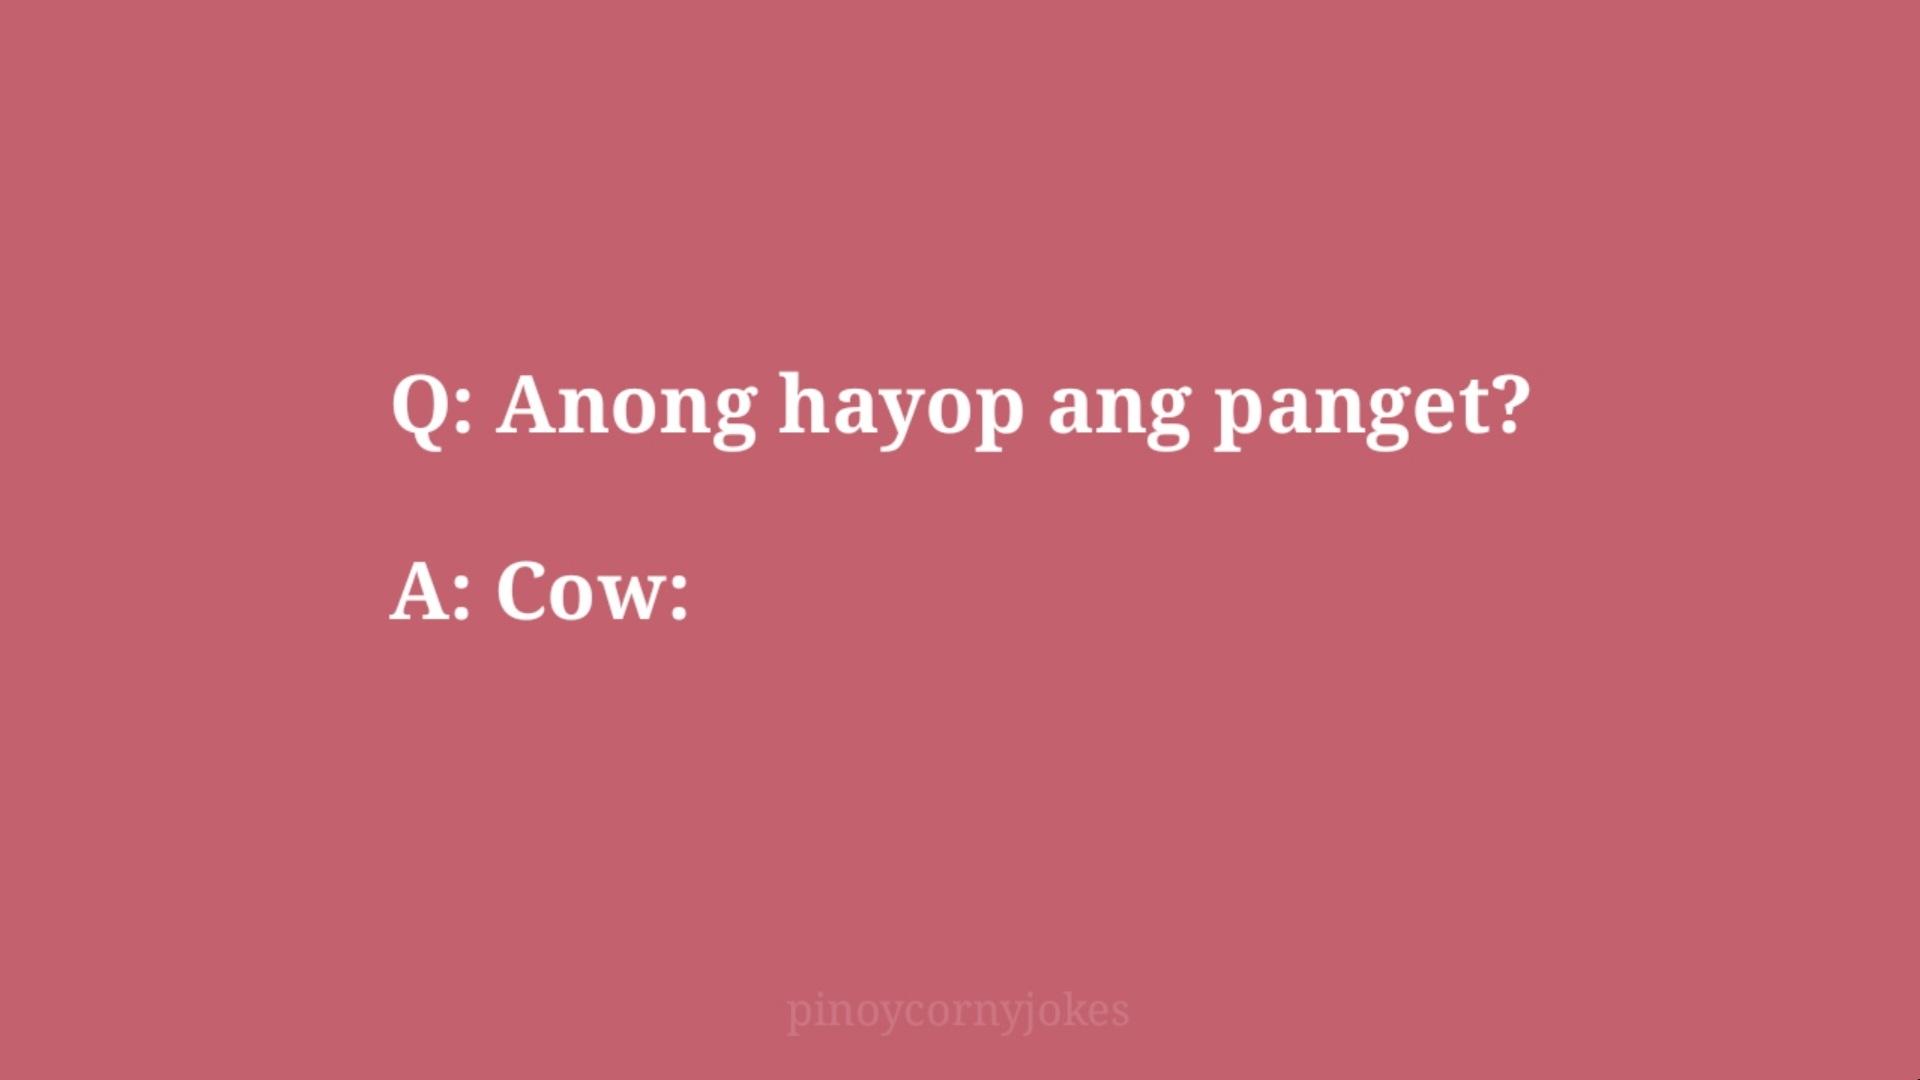 cow pinoy jokes qa